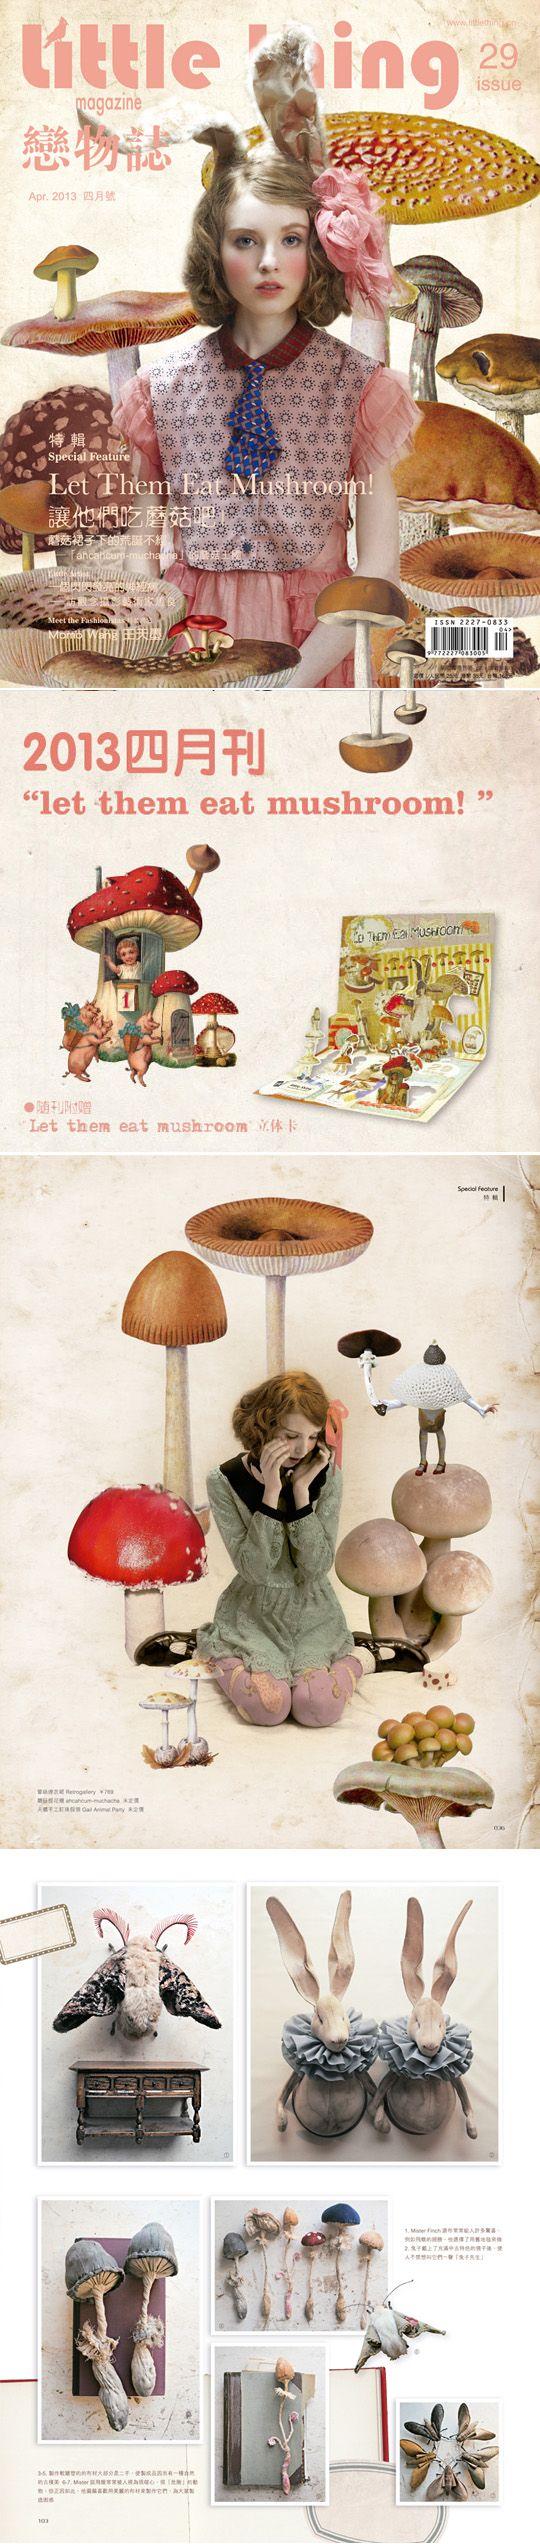 Little Thing #29 * Let them eat mushroom *